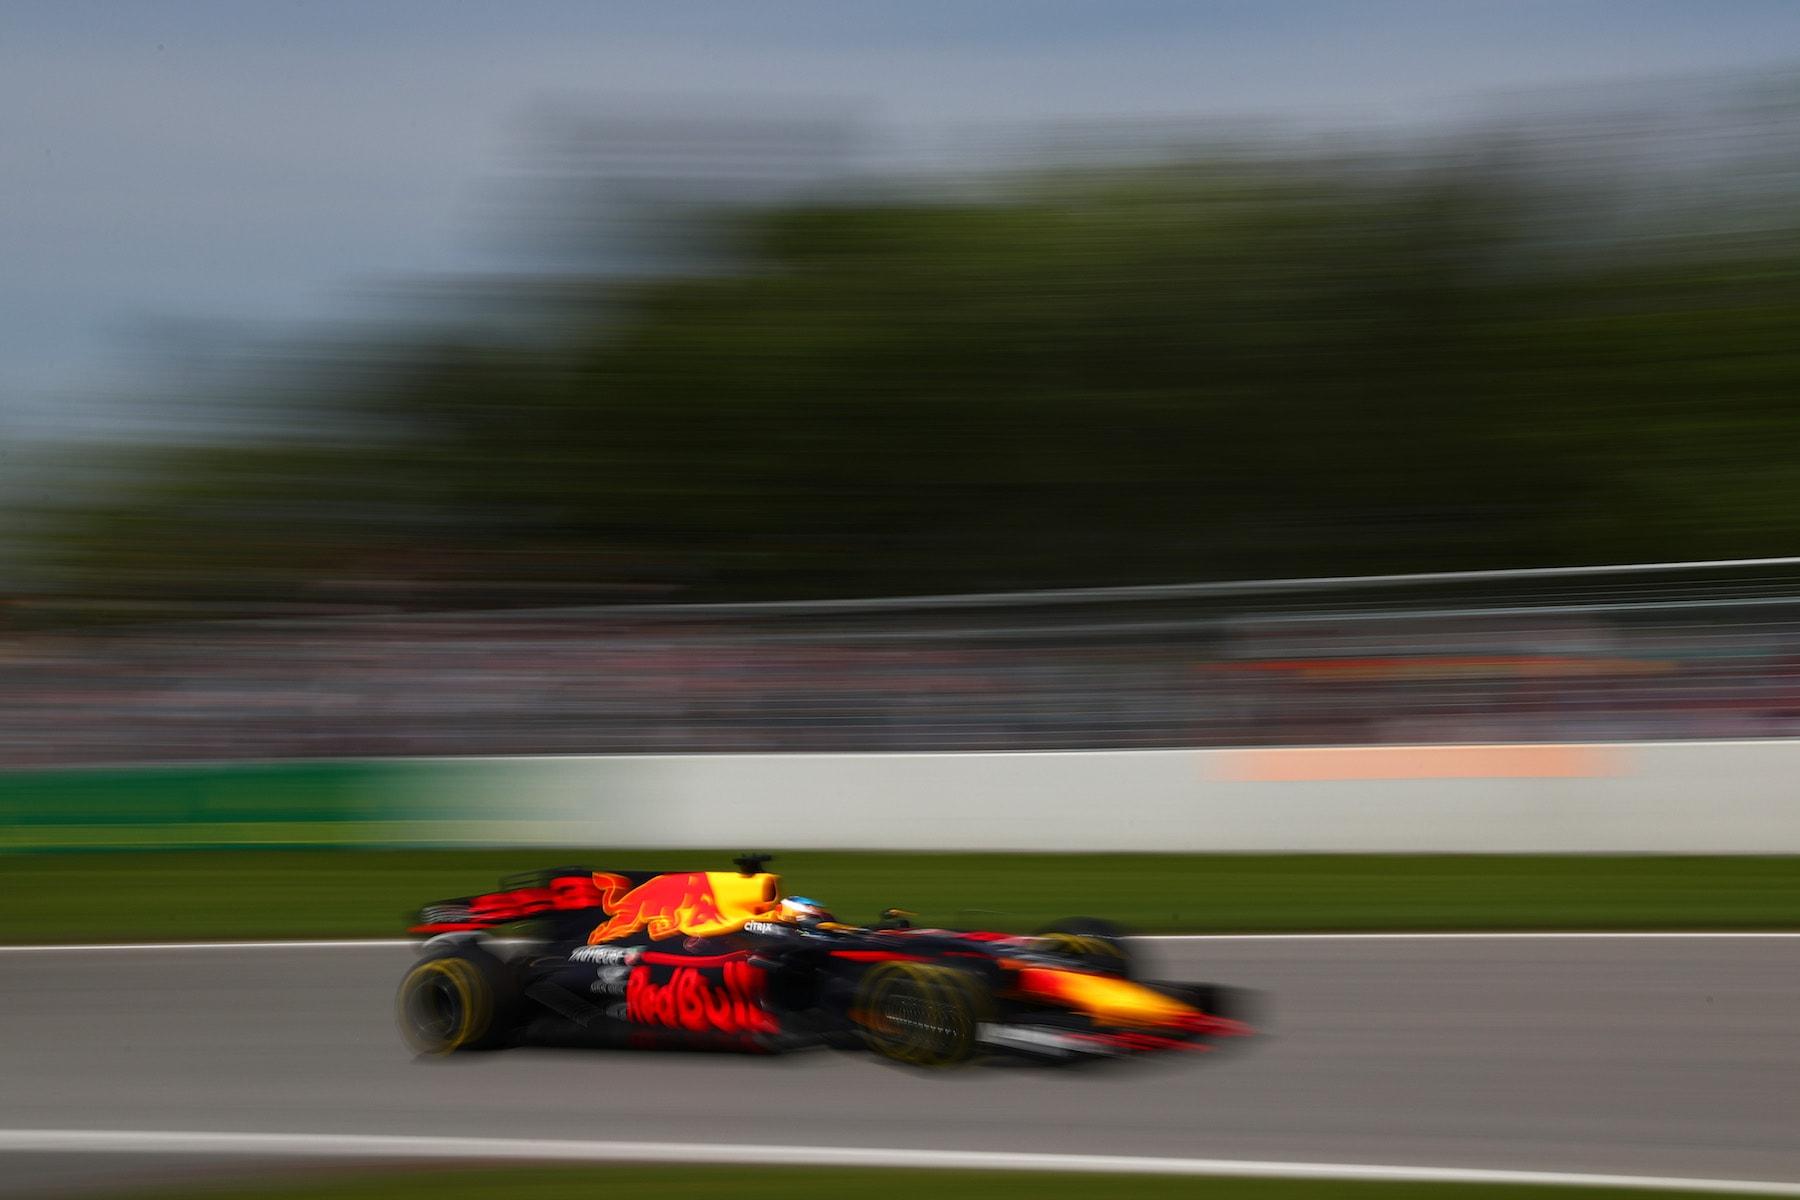 G 2017 Daniel Ricciardo | Red Bull RB13 | 2017 Canadian GP P3 4 copy.jpg